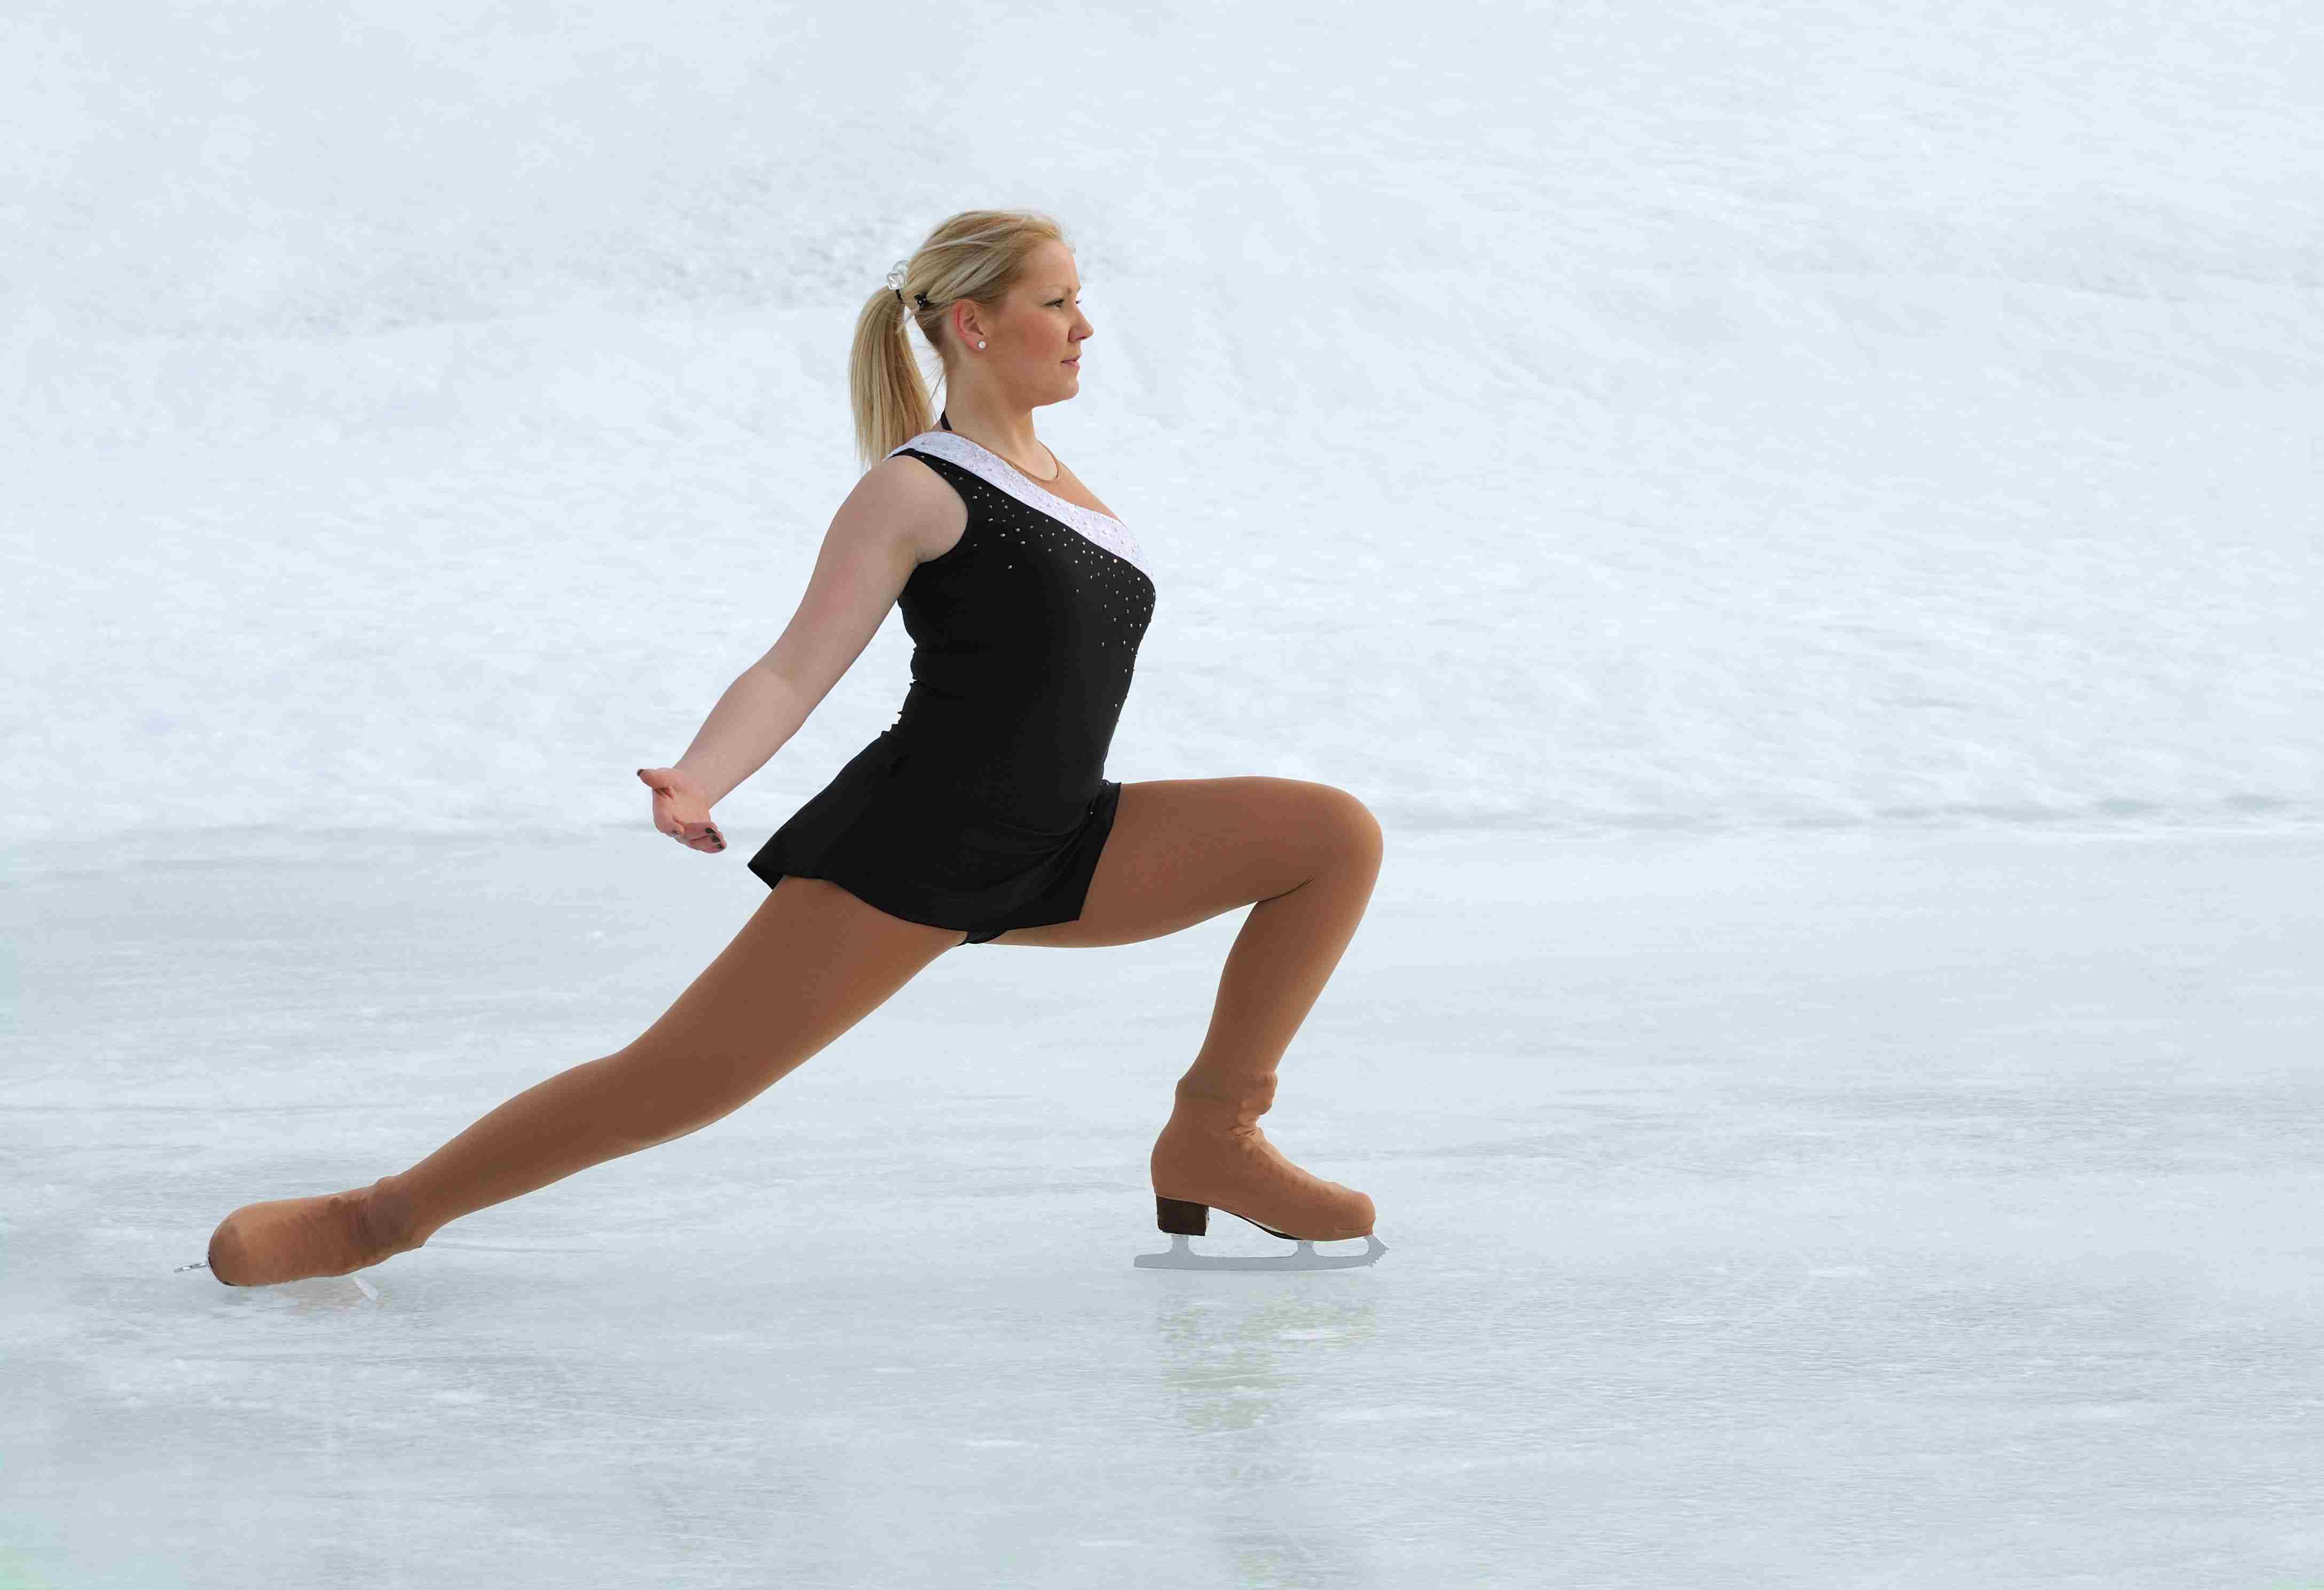 A Figure Skater Skates to Music